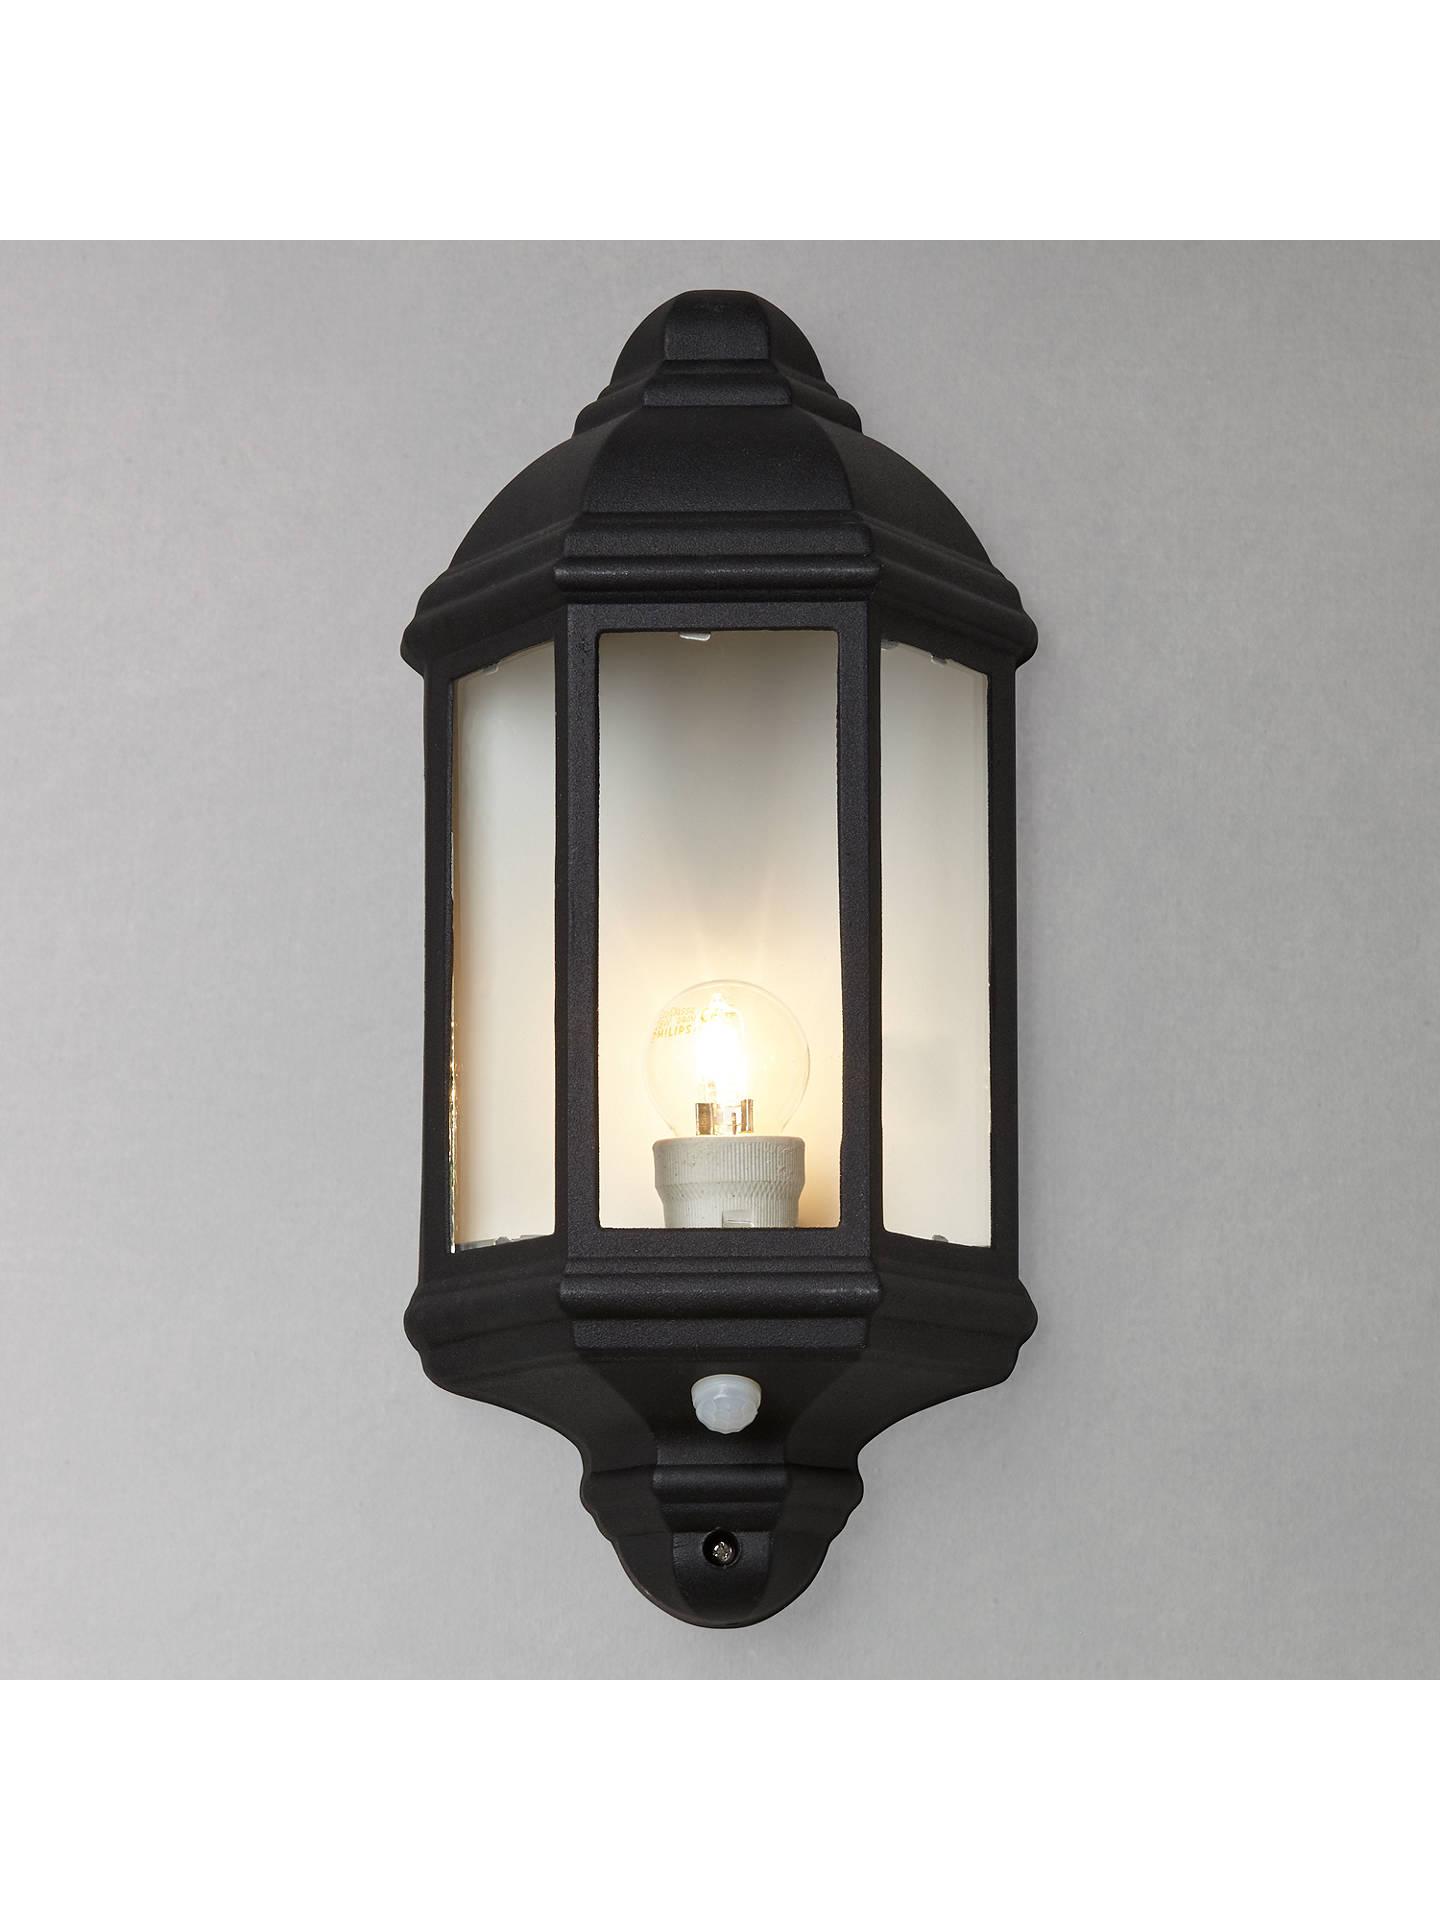 Harris Outdoor Pir Sensor Half Lantern